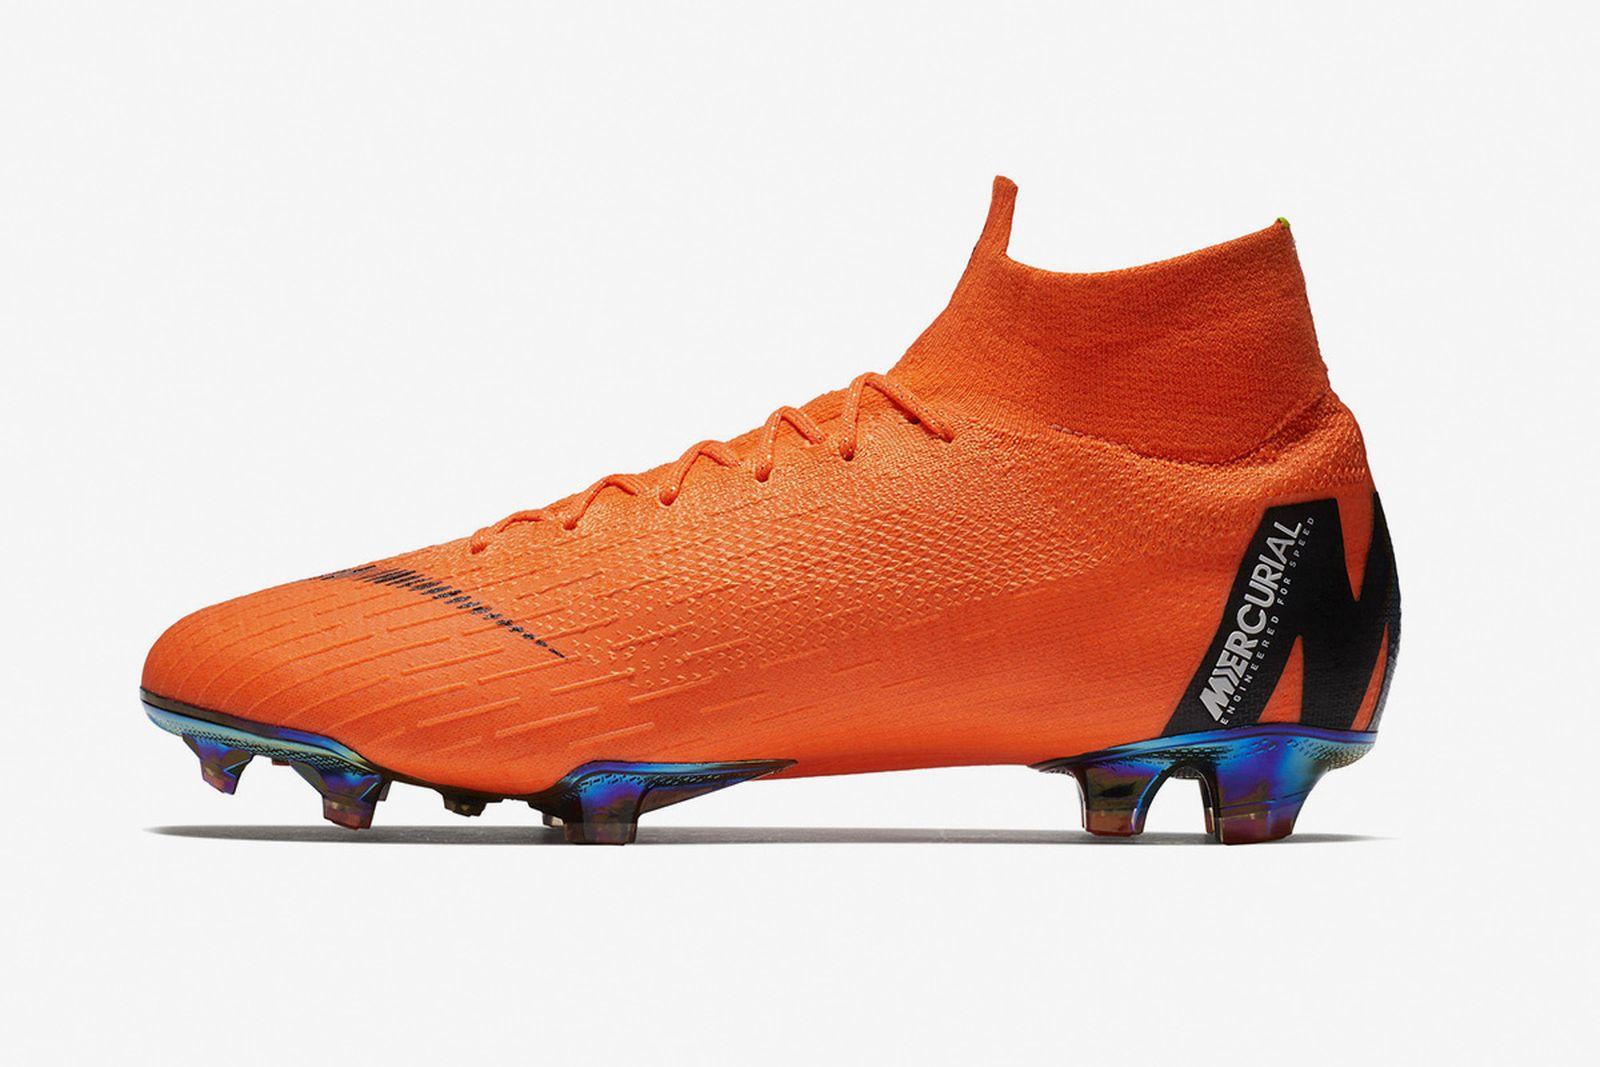 nike-mercurial-superfly-football-boot-022